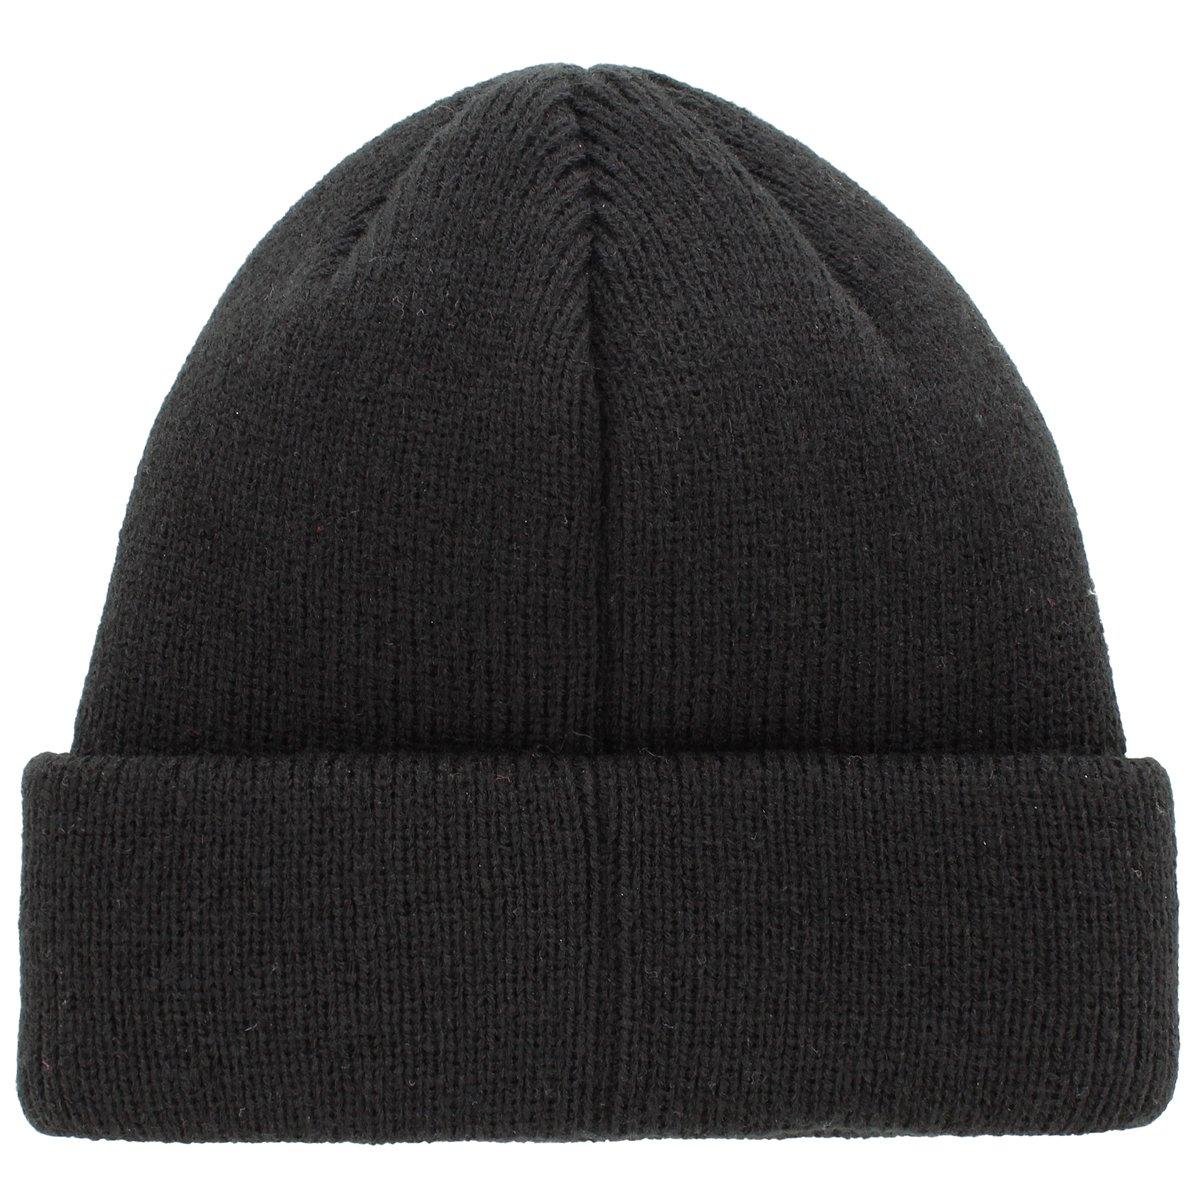 e80c3103b9d Adidas Womens Originals Trefoil Ii Knit Beanie Agron Hats    Accessories  976056